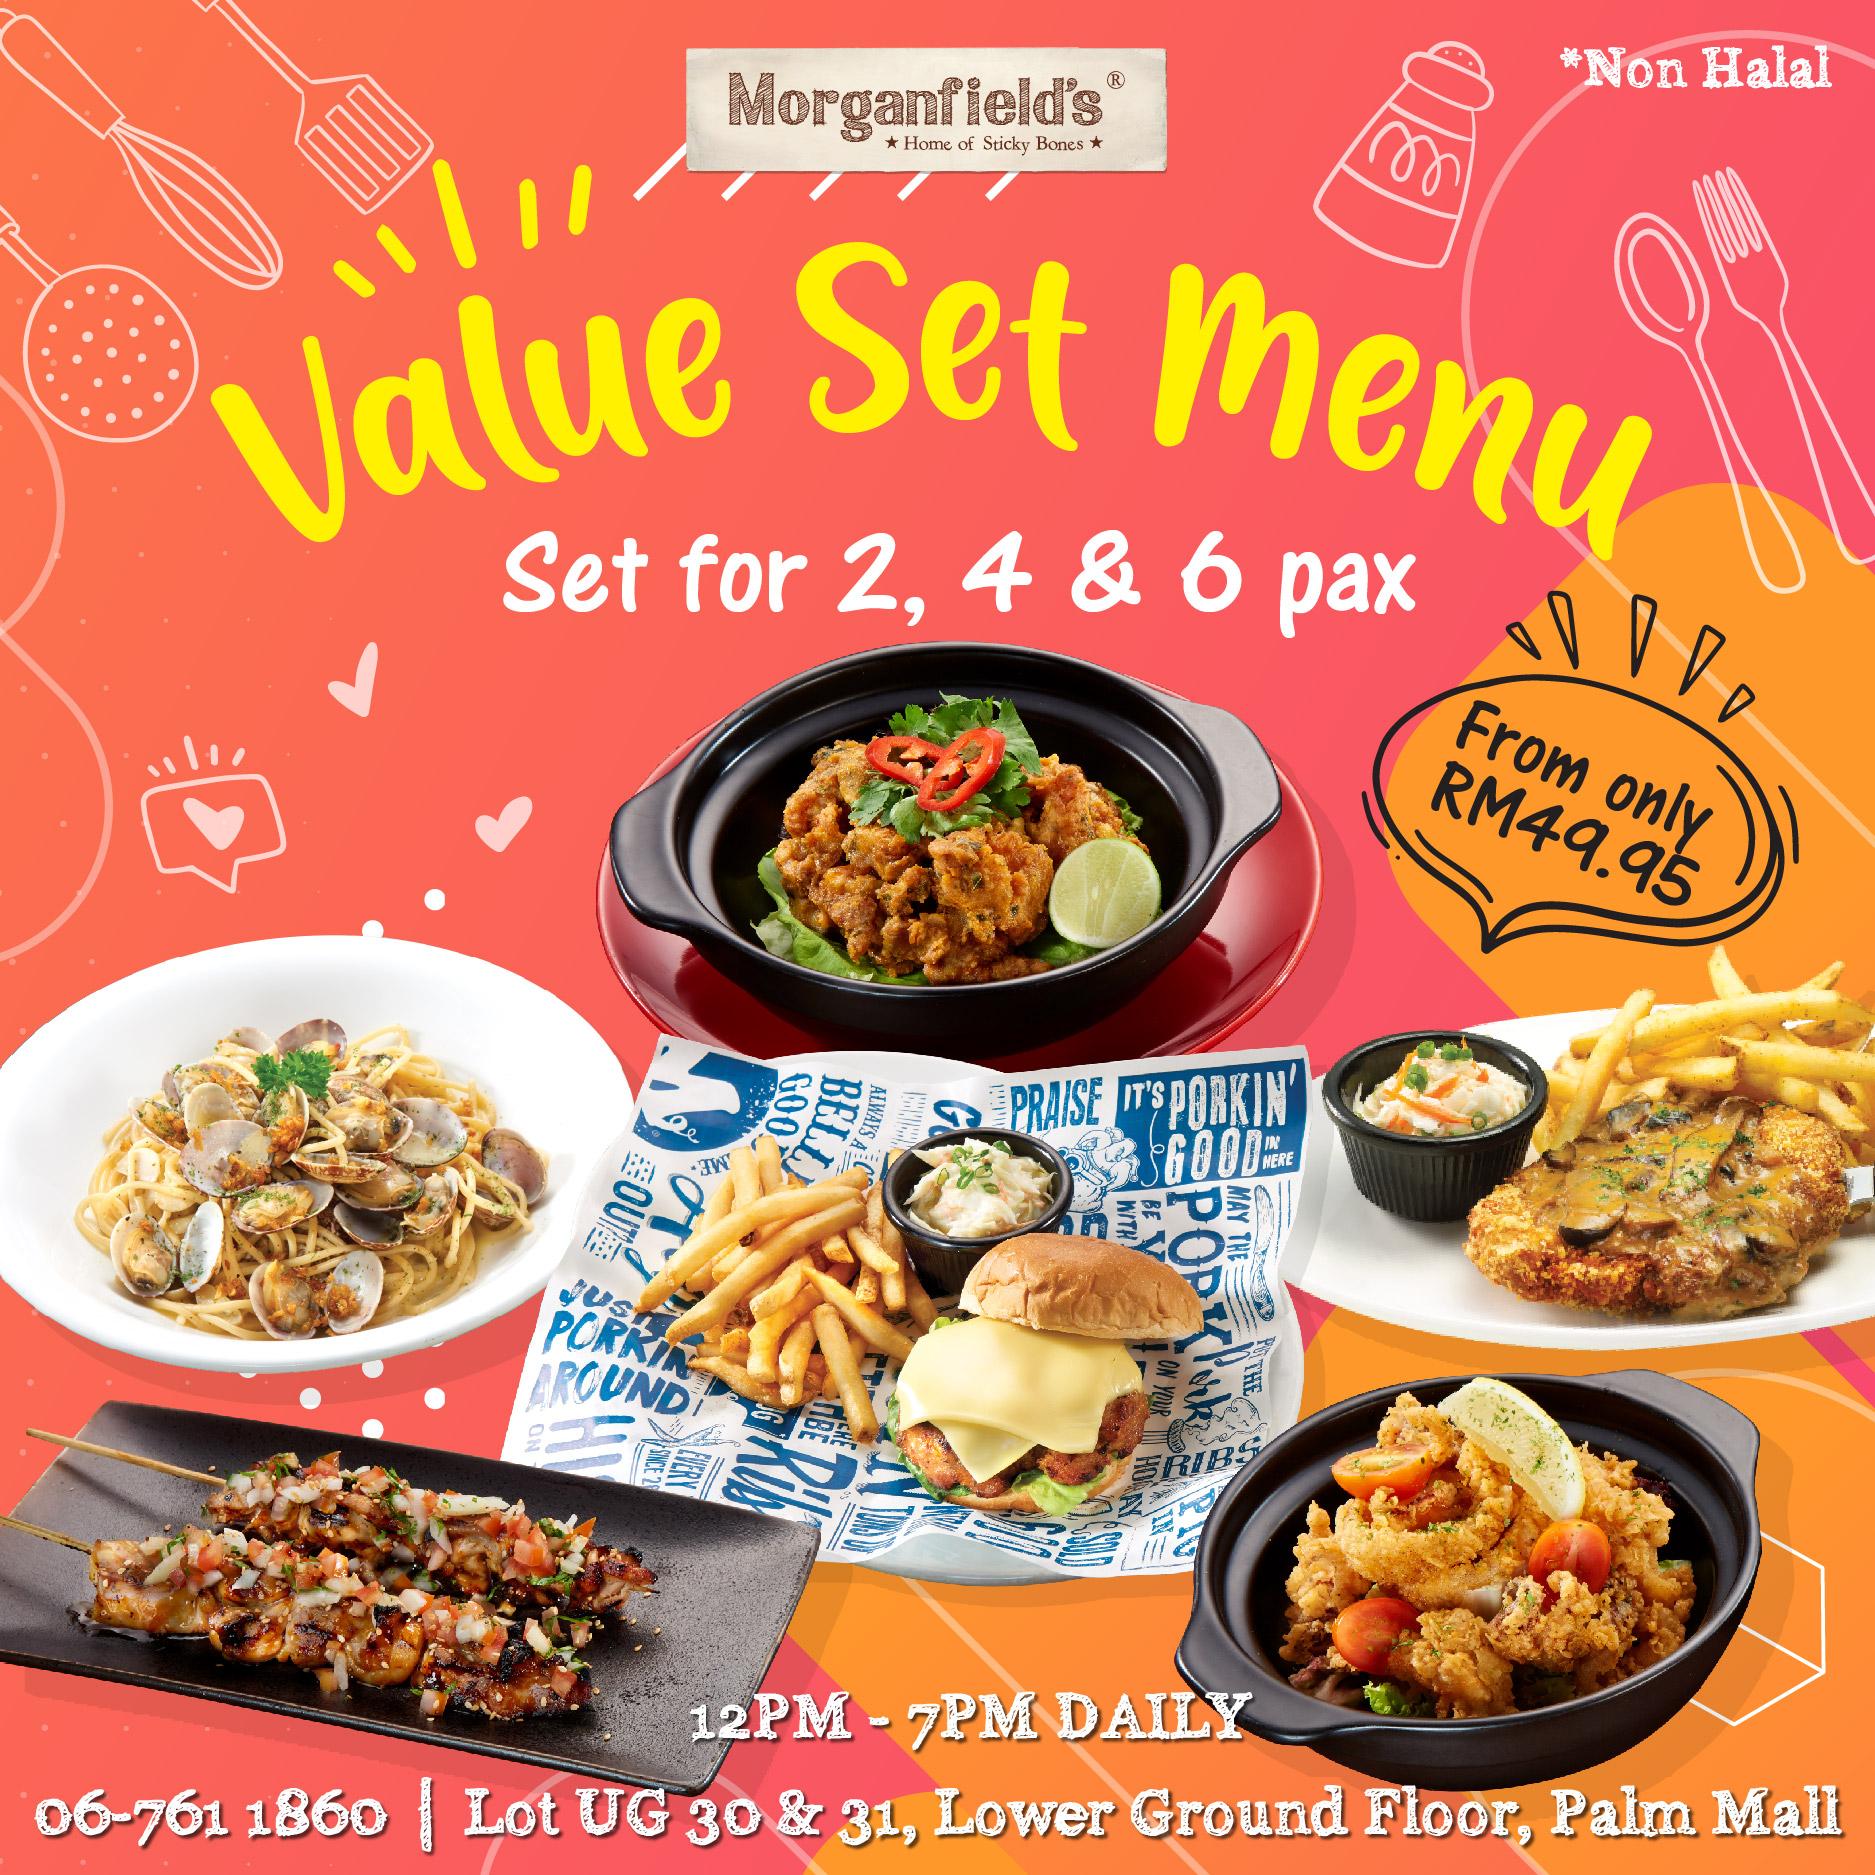 Morganfield's Value Set Menu